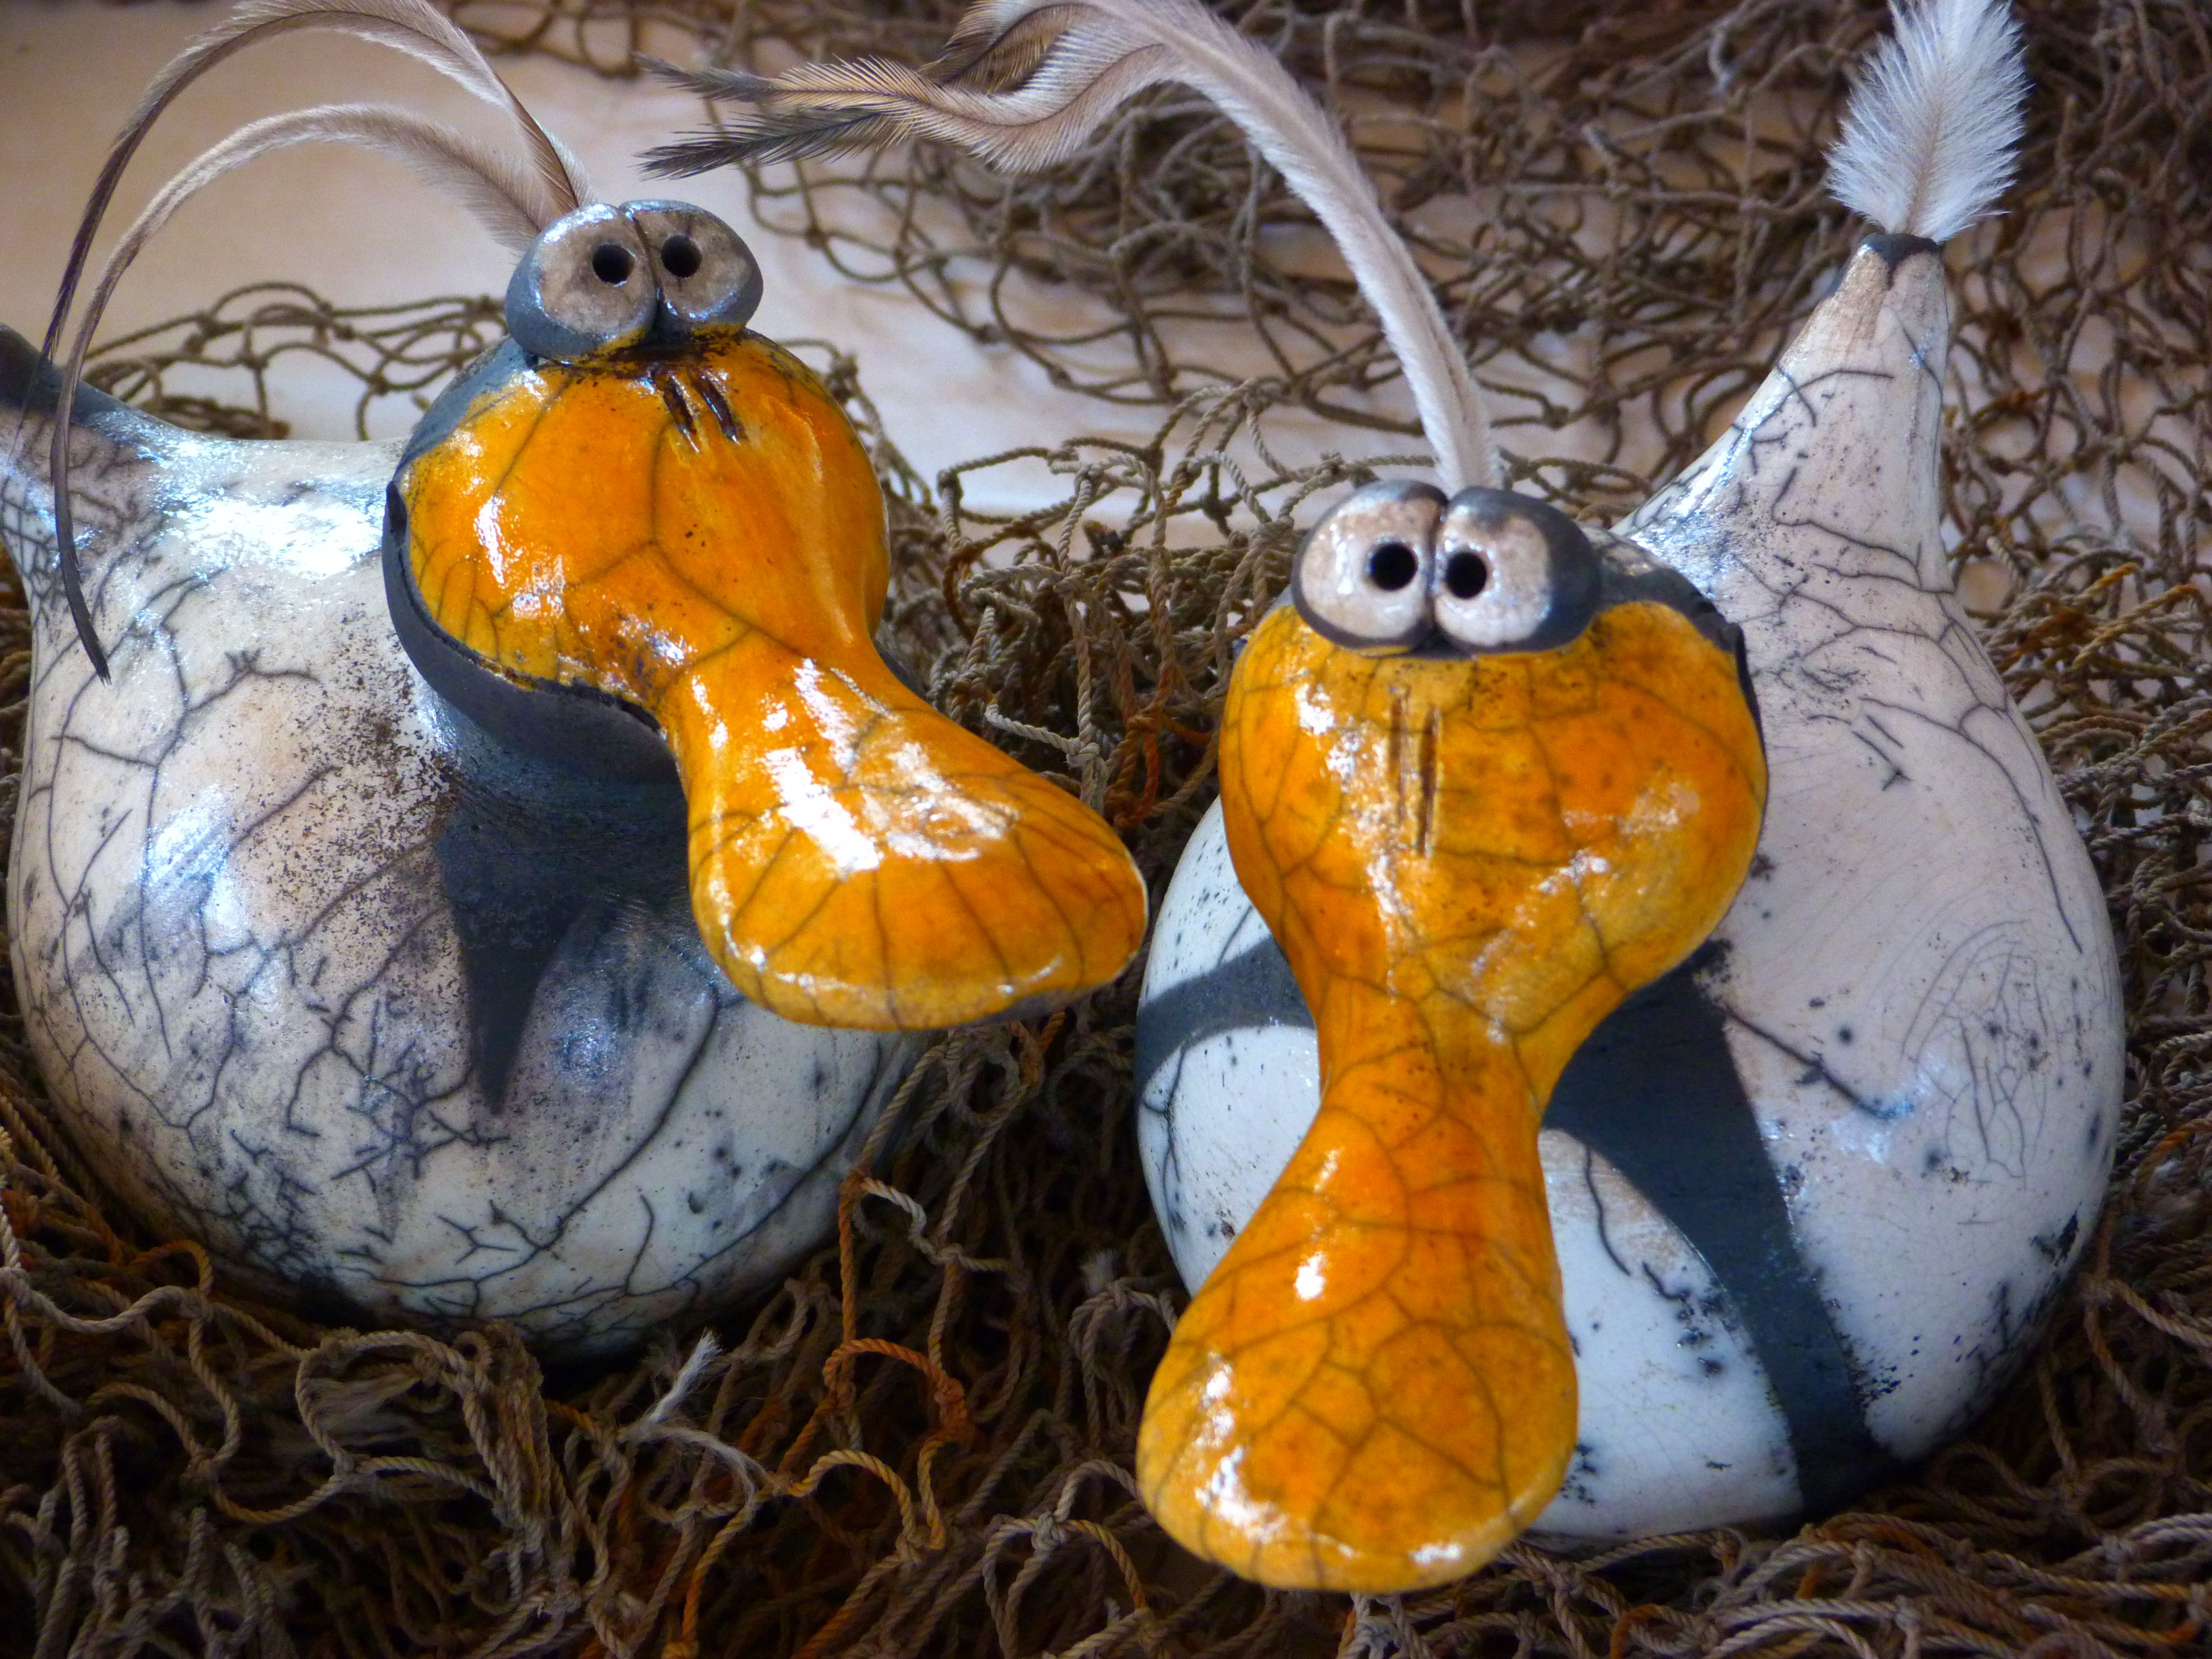 Ton Tiere Keramik Vögel Tierfiguren Töpfern Ideen Scherben Glasur Modelliermasse Gartenkunst Knete